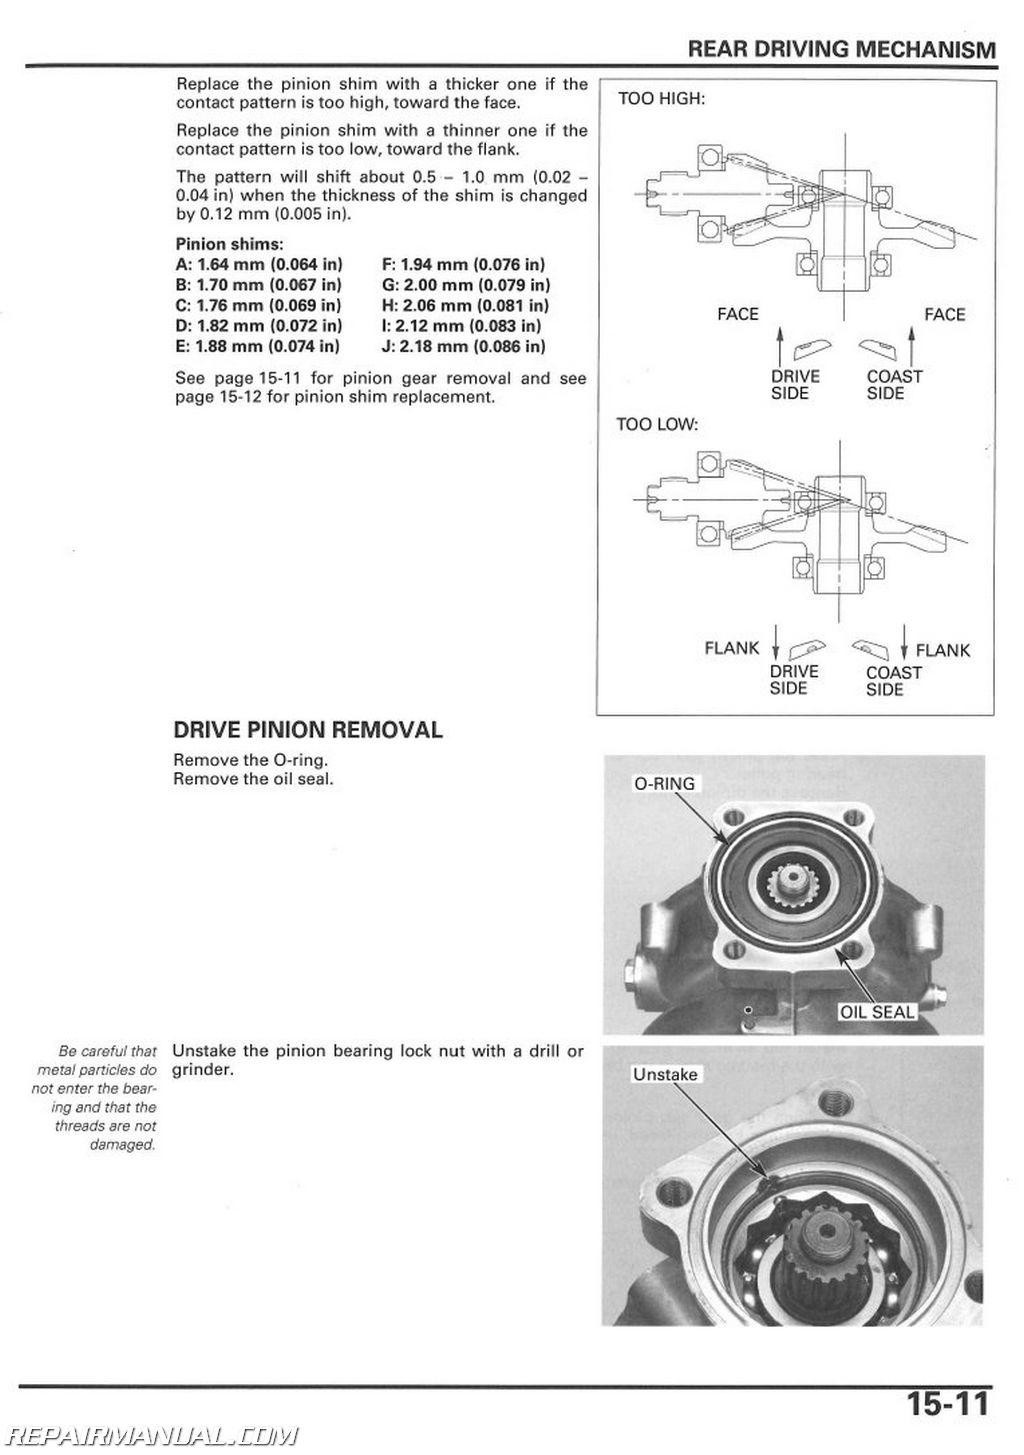 hight resolution of 2005 2018 honda trx250te tm recon atv service manual rh repairmanual com 1998 honda 250 recon